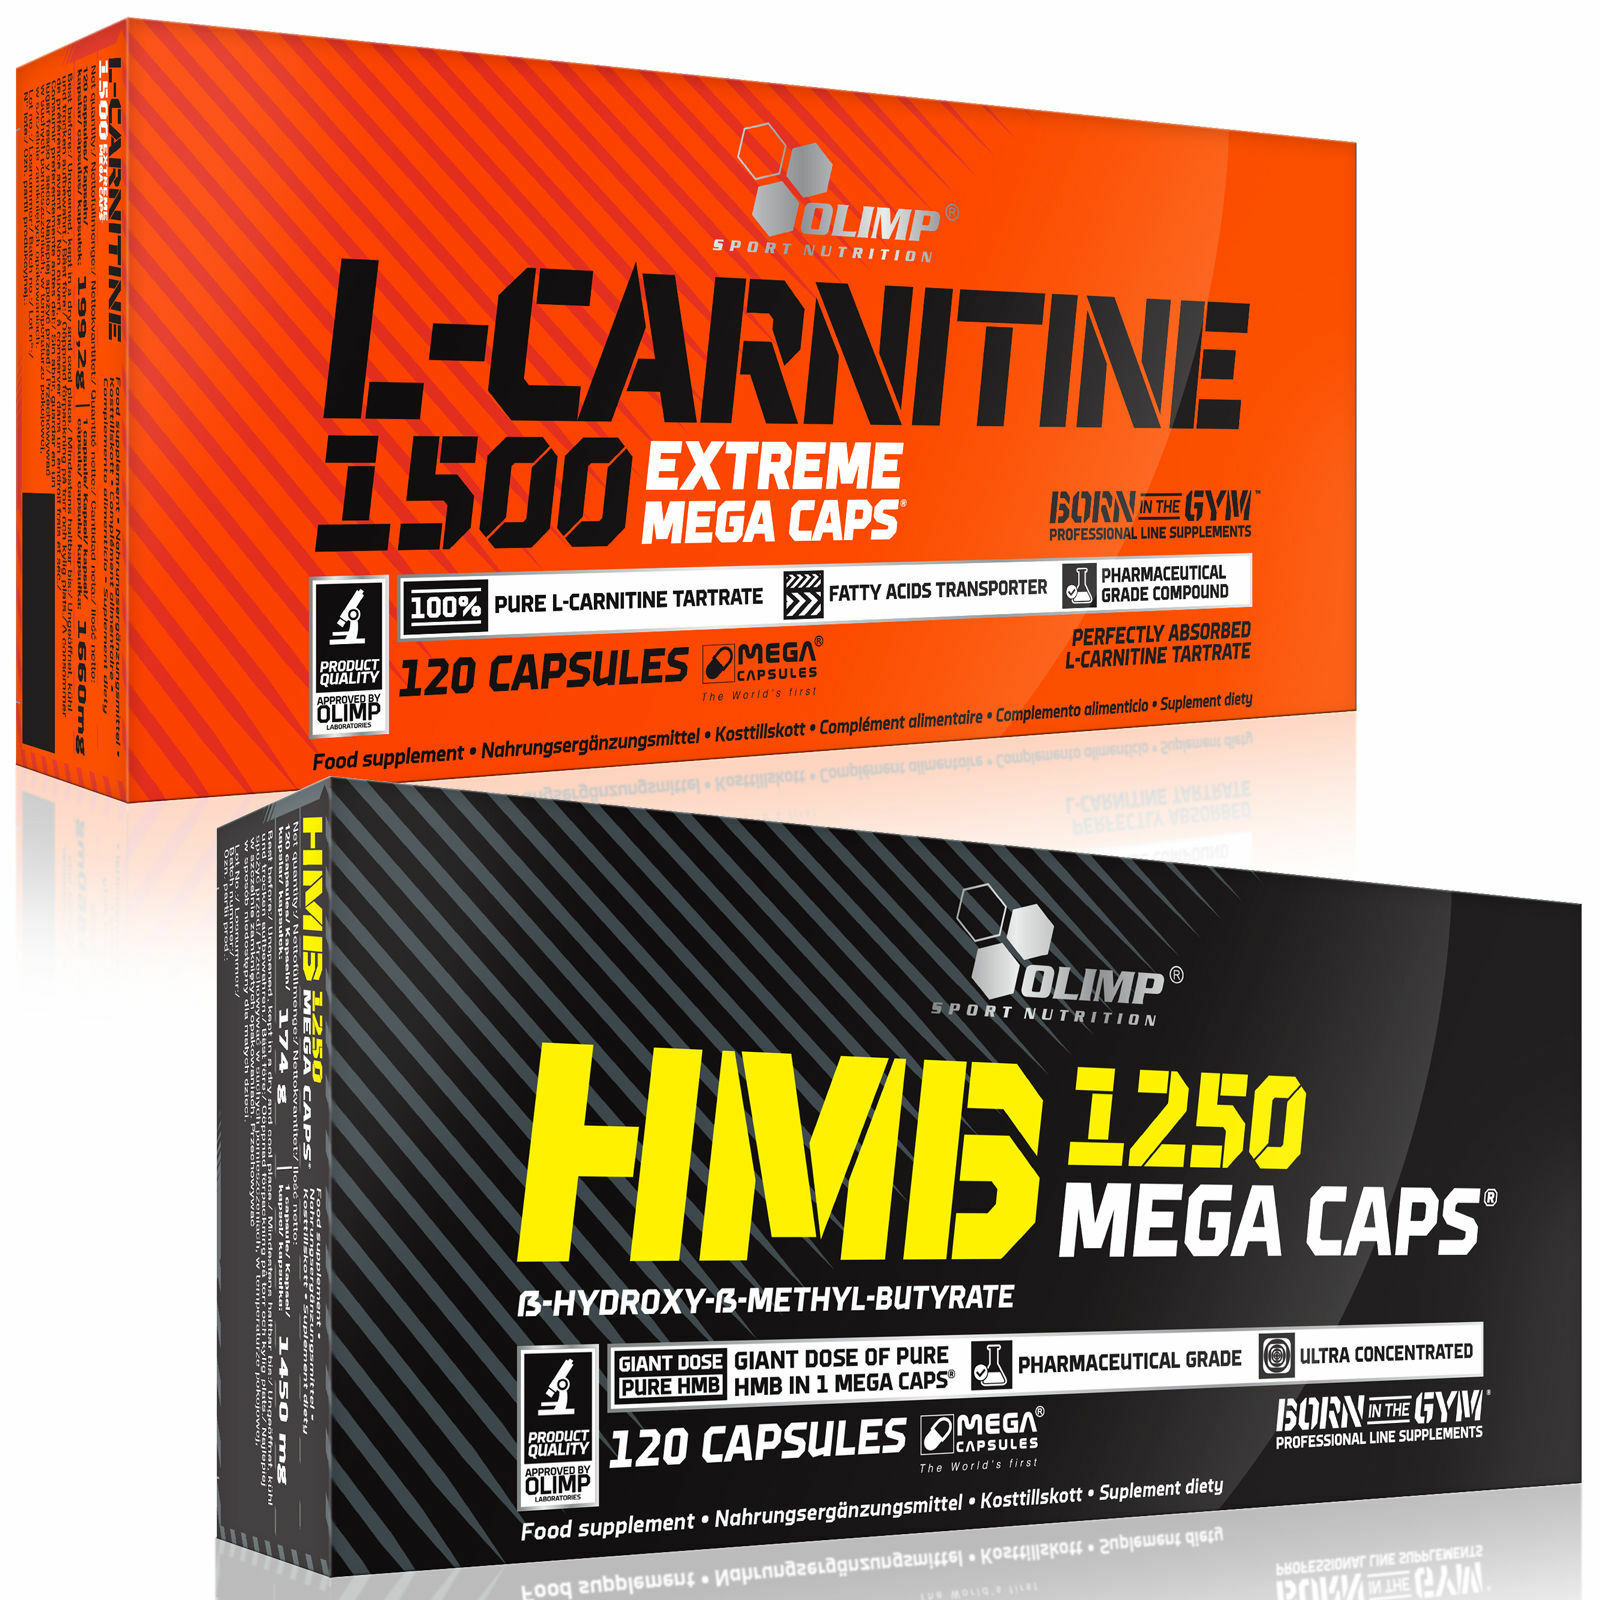 L-Carnitine + HMB 60-120 Capsules Non-Stimulant Fat Burner Weight Loss Slimming 1